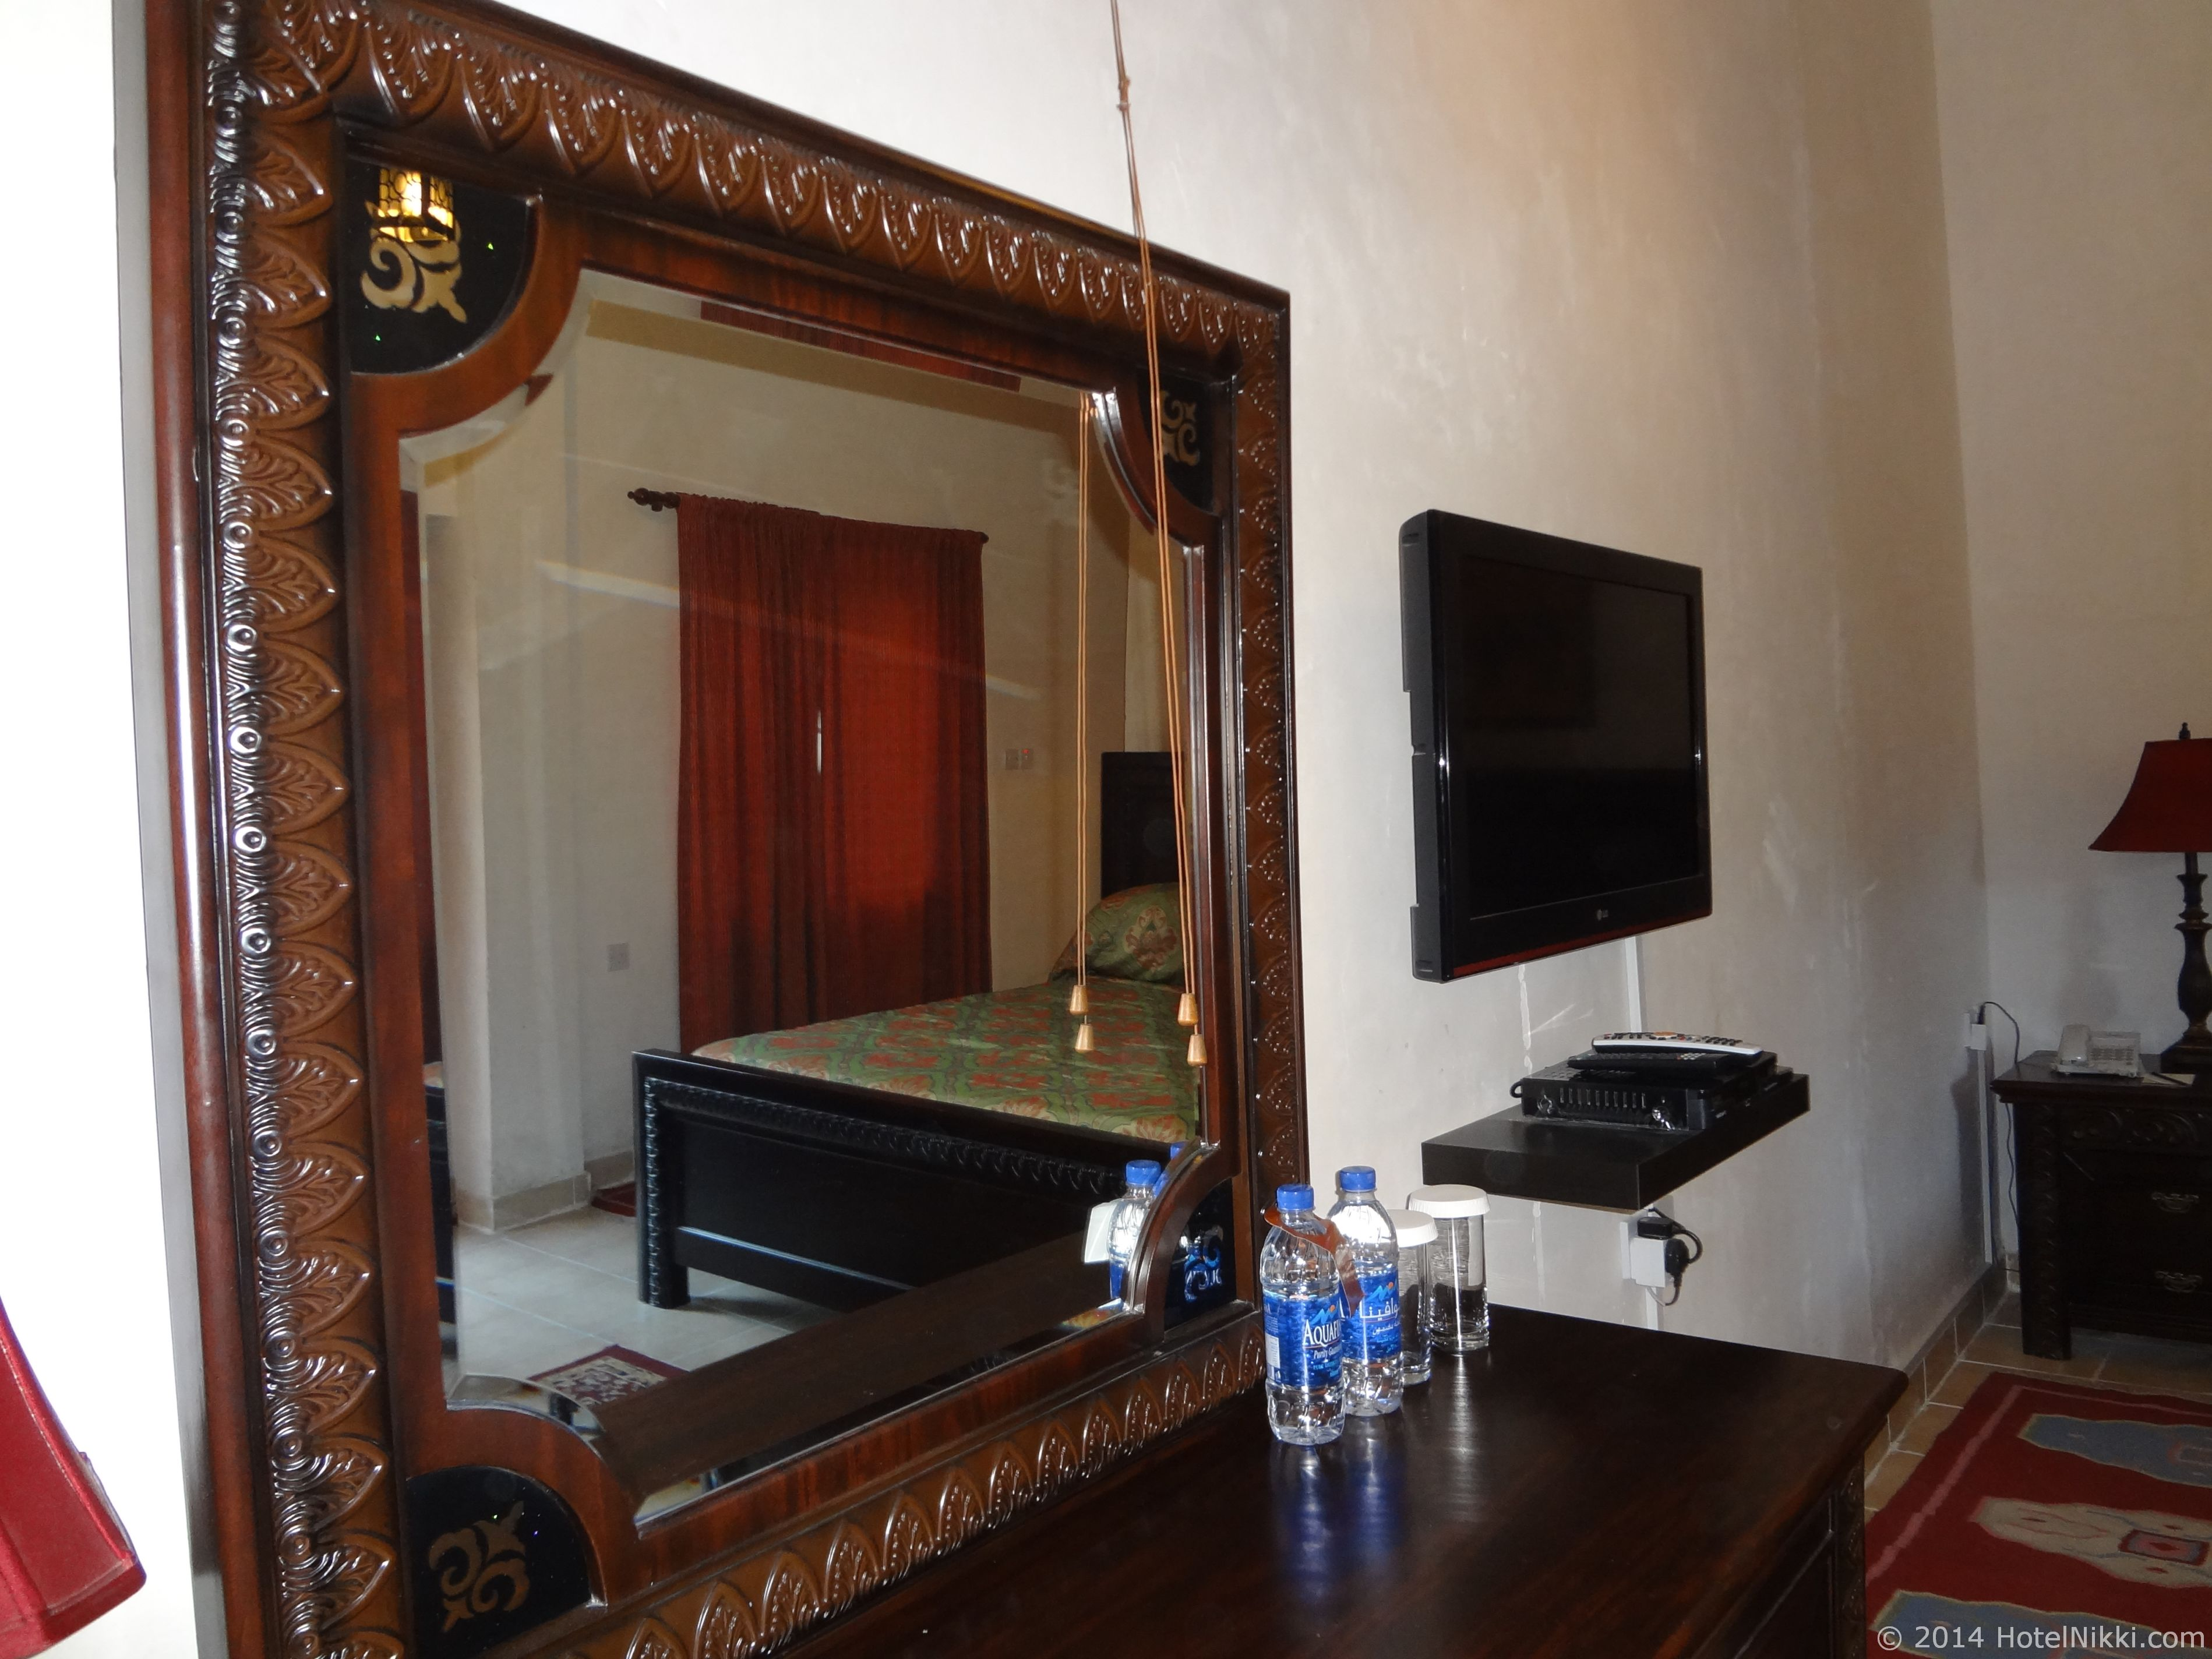 Ahmedia Heritage Guest House 無料のお水が2本